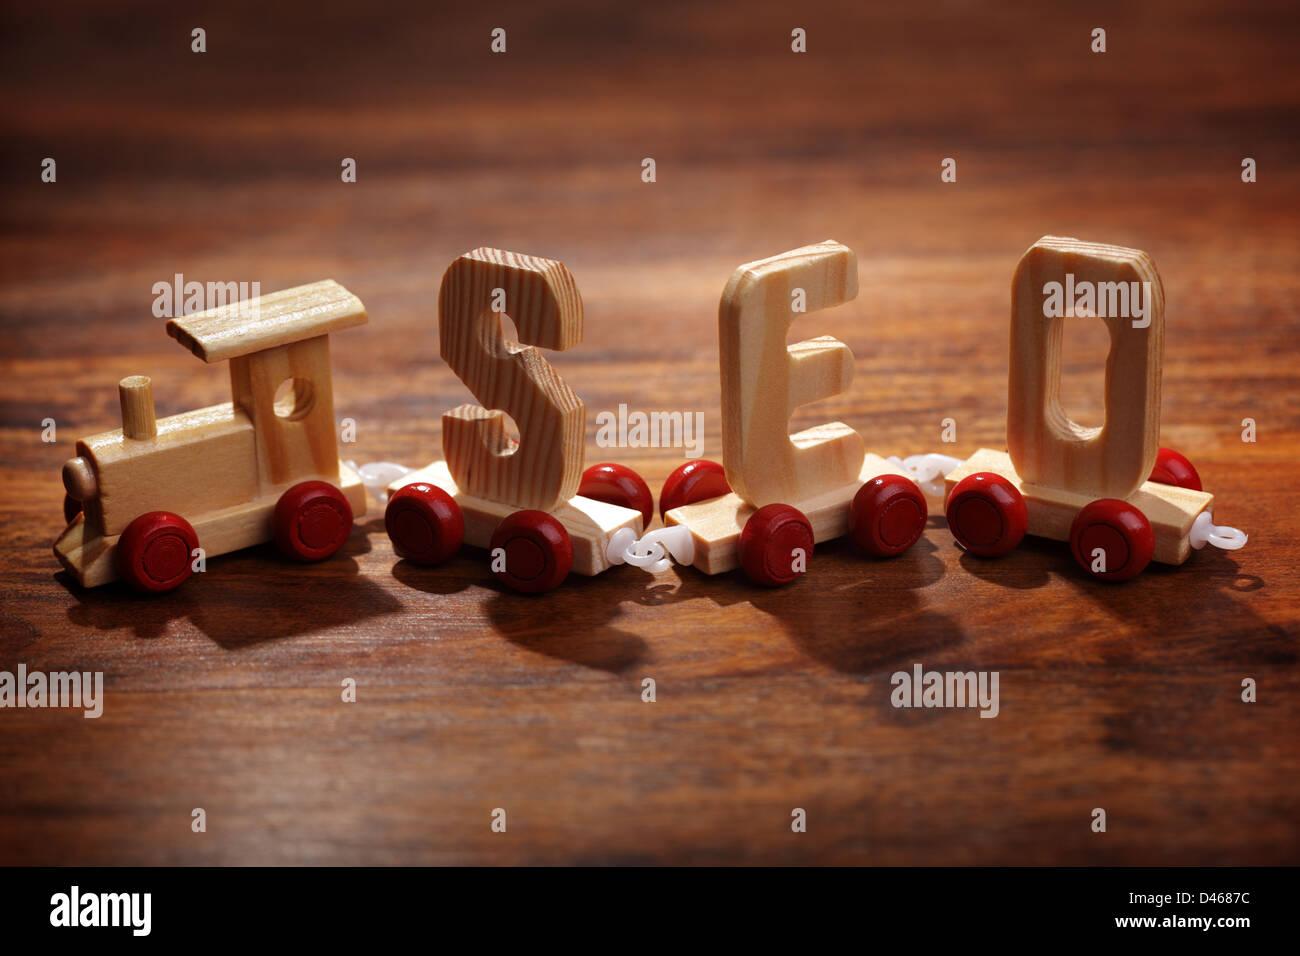 SEO - Search Engine Optimization Photo Stock